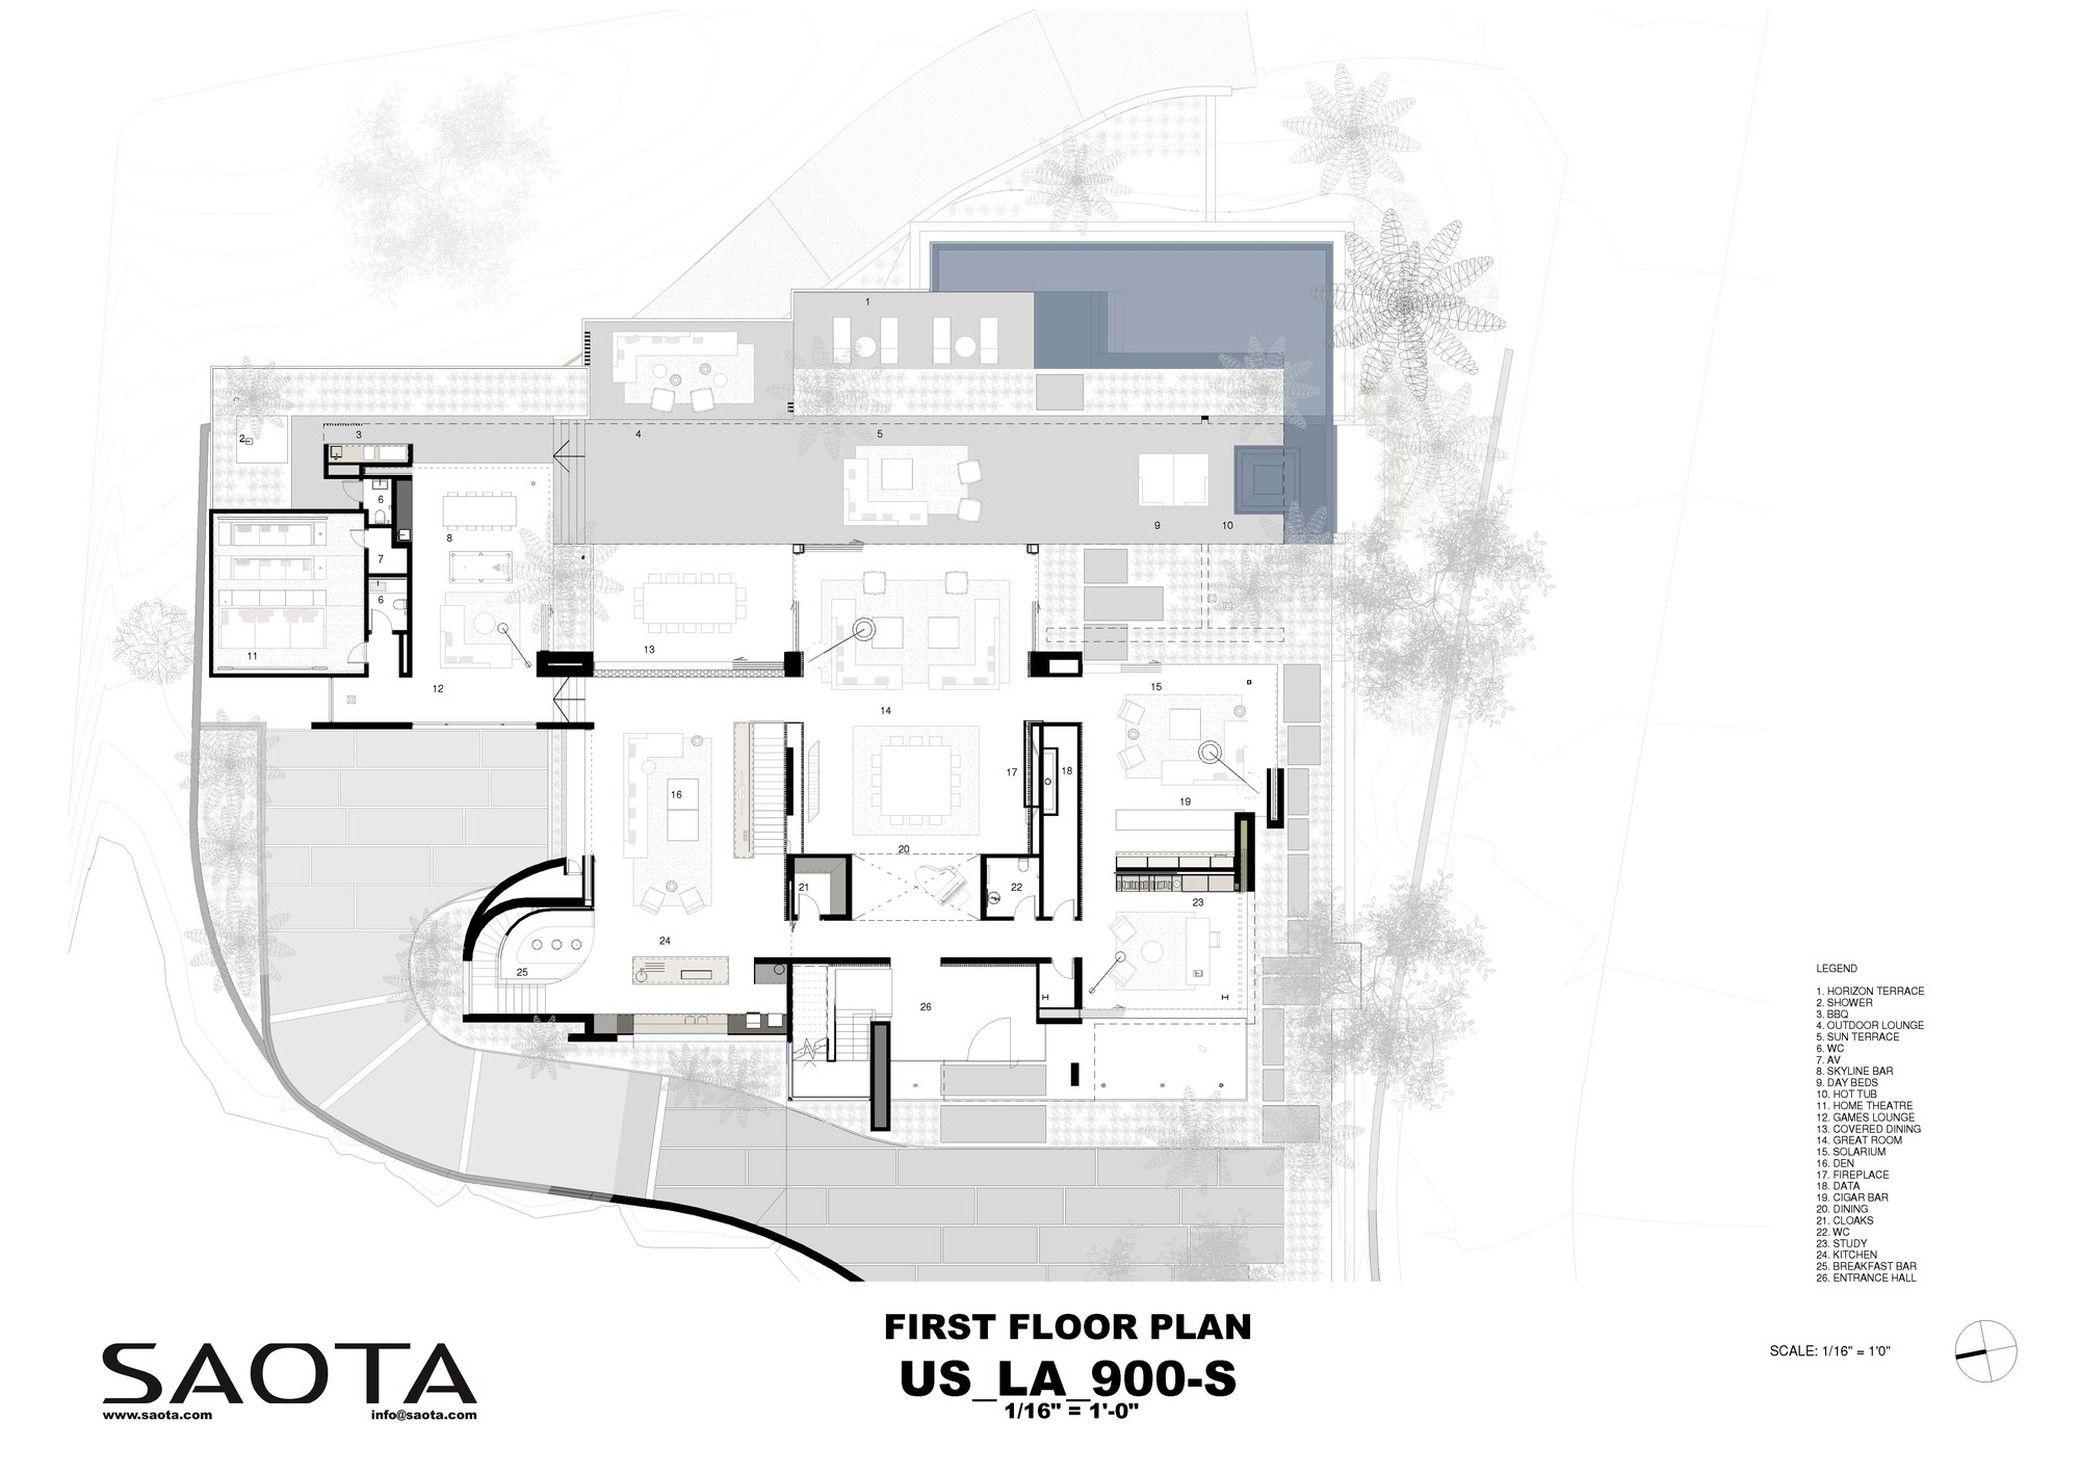 Stradella Saota Arch2o Com Floor Plans Beautiful Houses Interior How To Plan